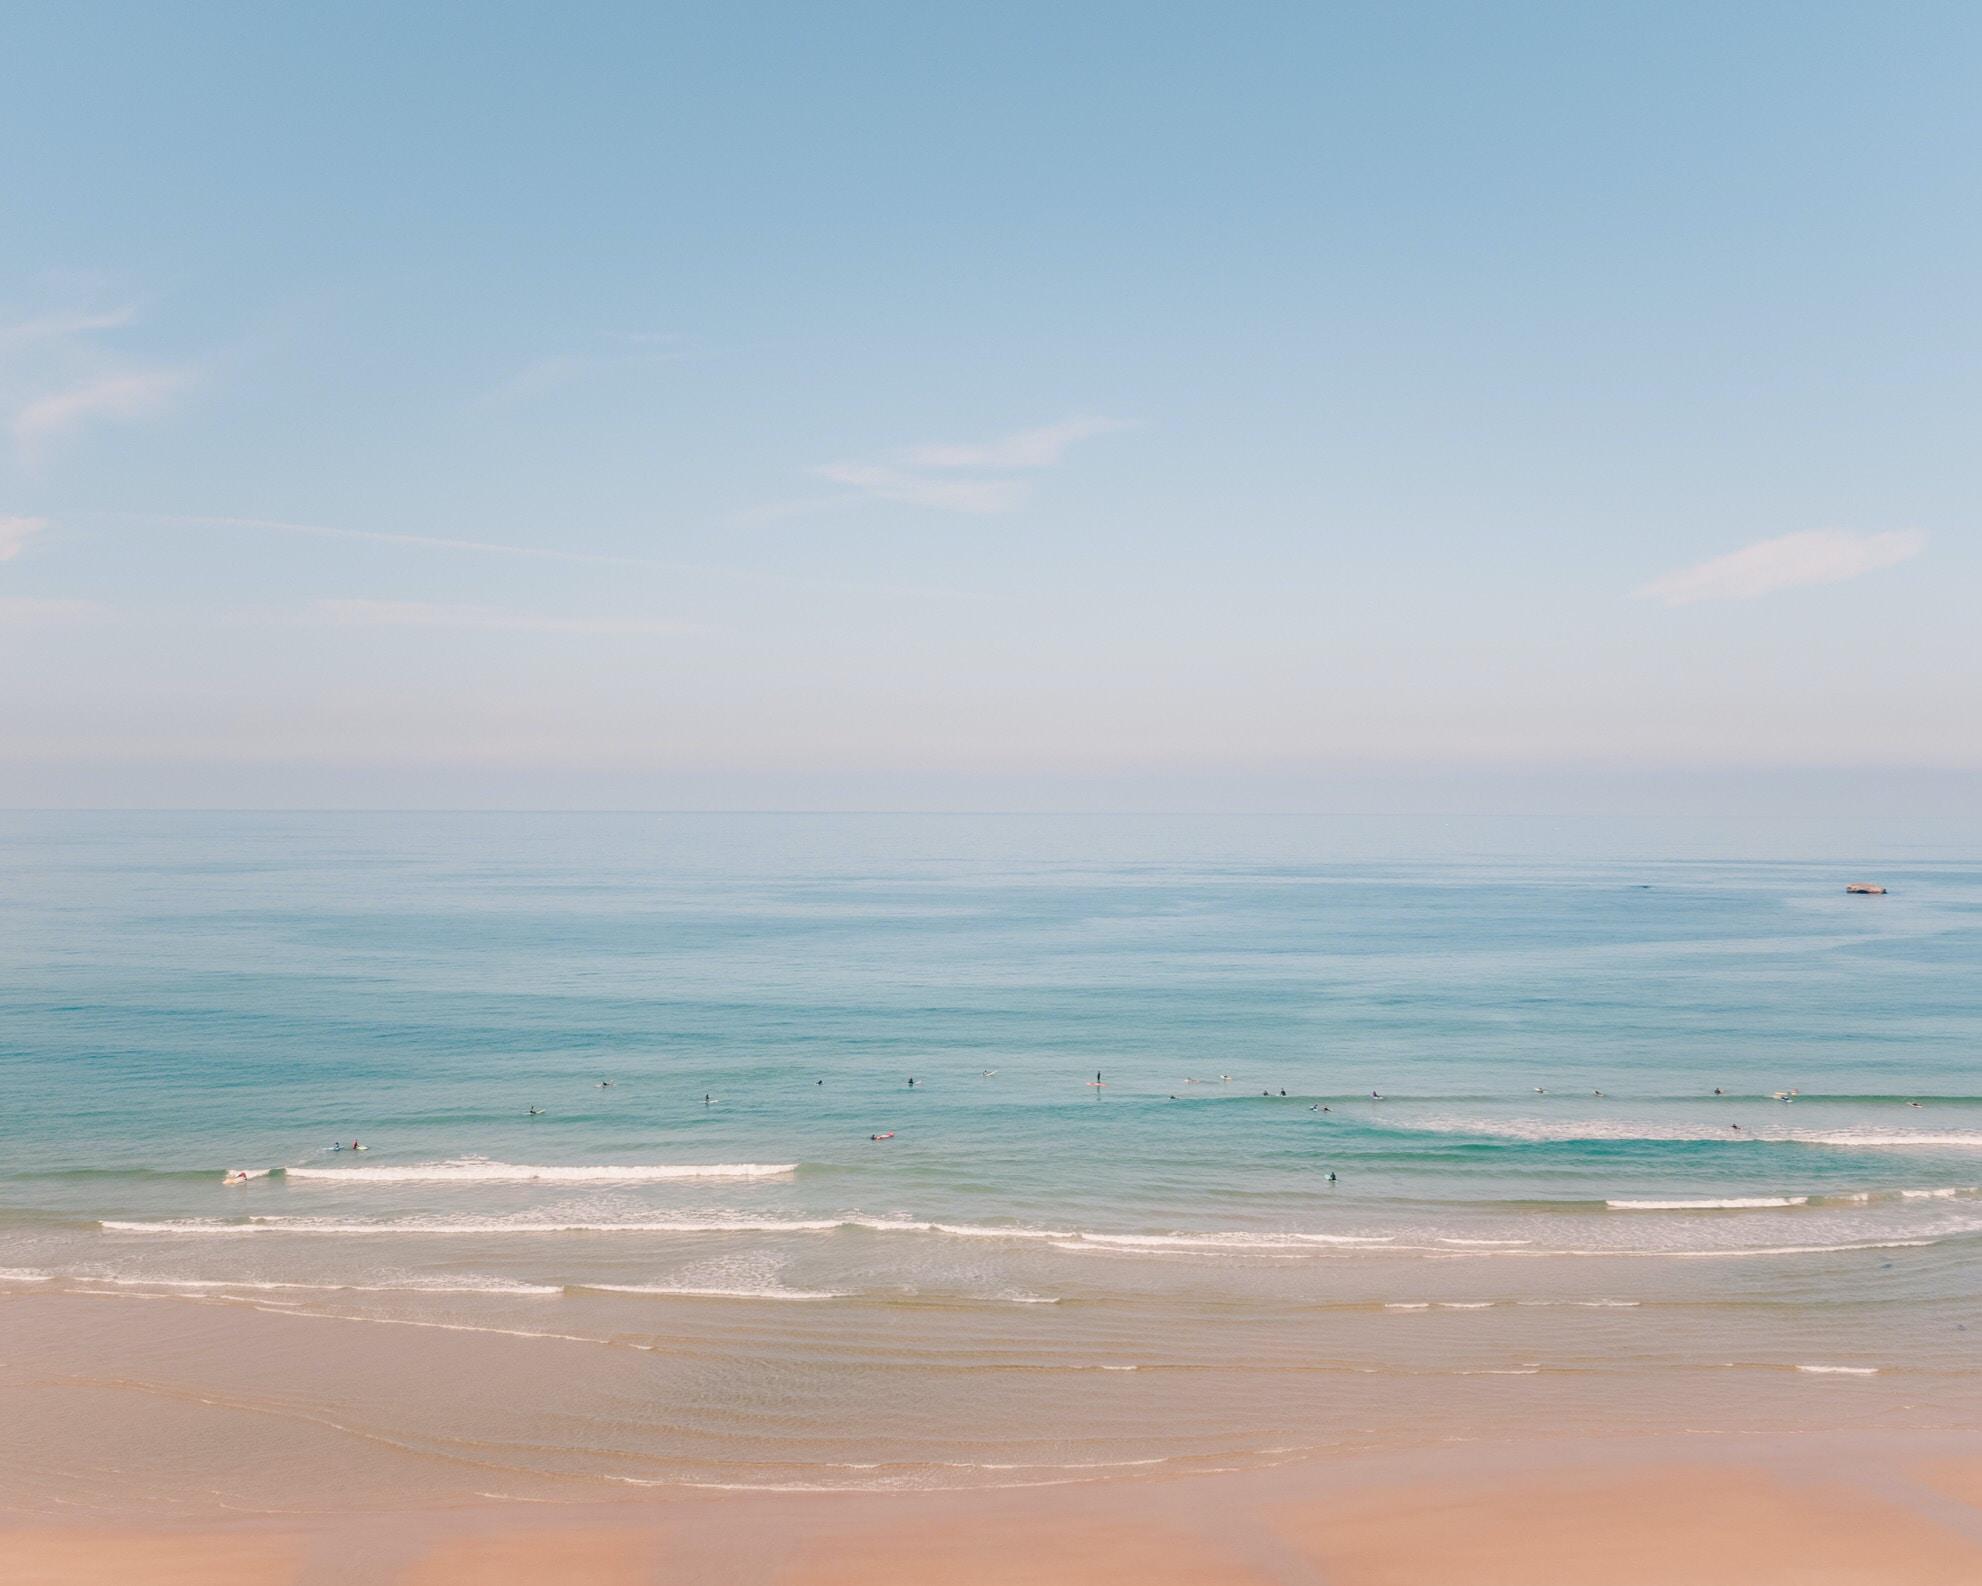 photograph of beach